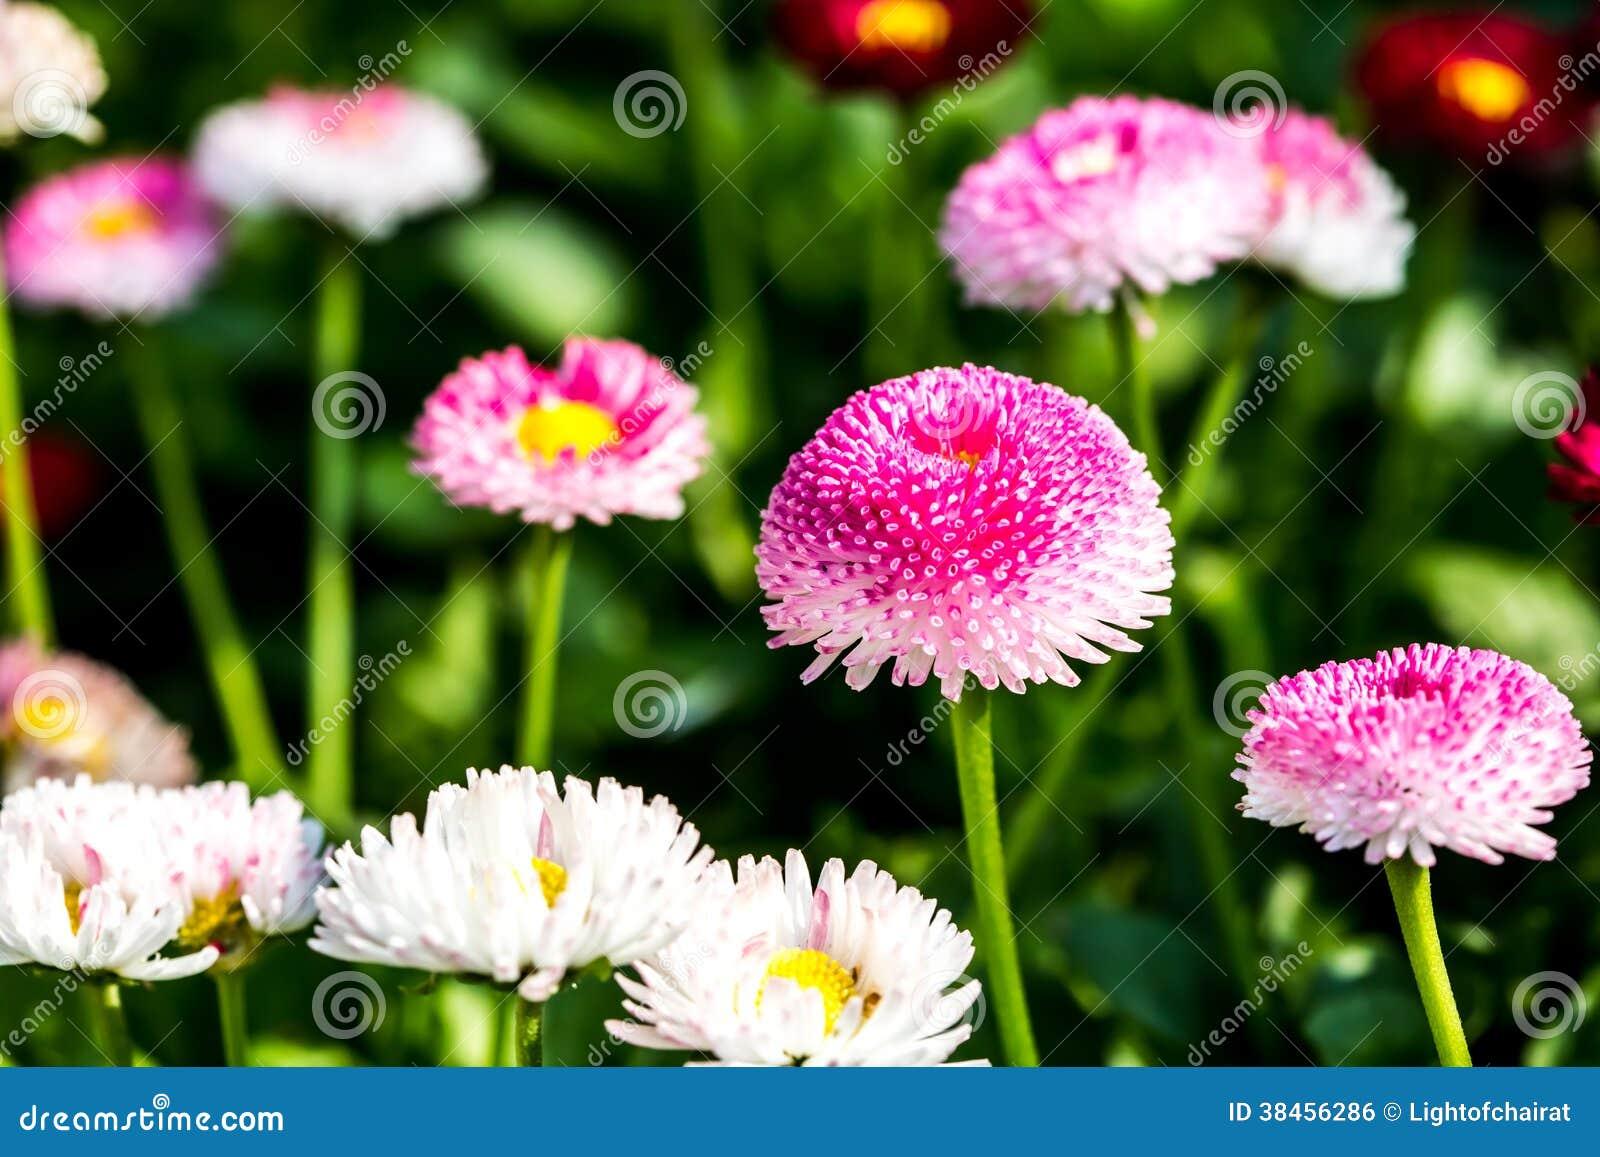 English daisy flowers in chiangmai thailand stock photo image of download english daisy flowers in chiangmai thailand stock photo image of bright chiangmai izmirmasajfo